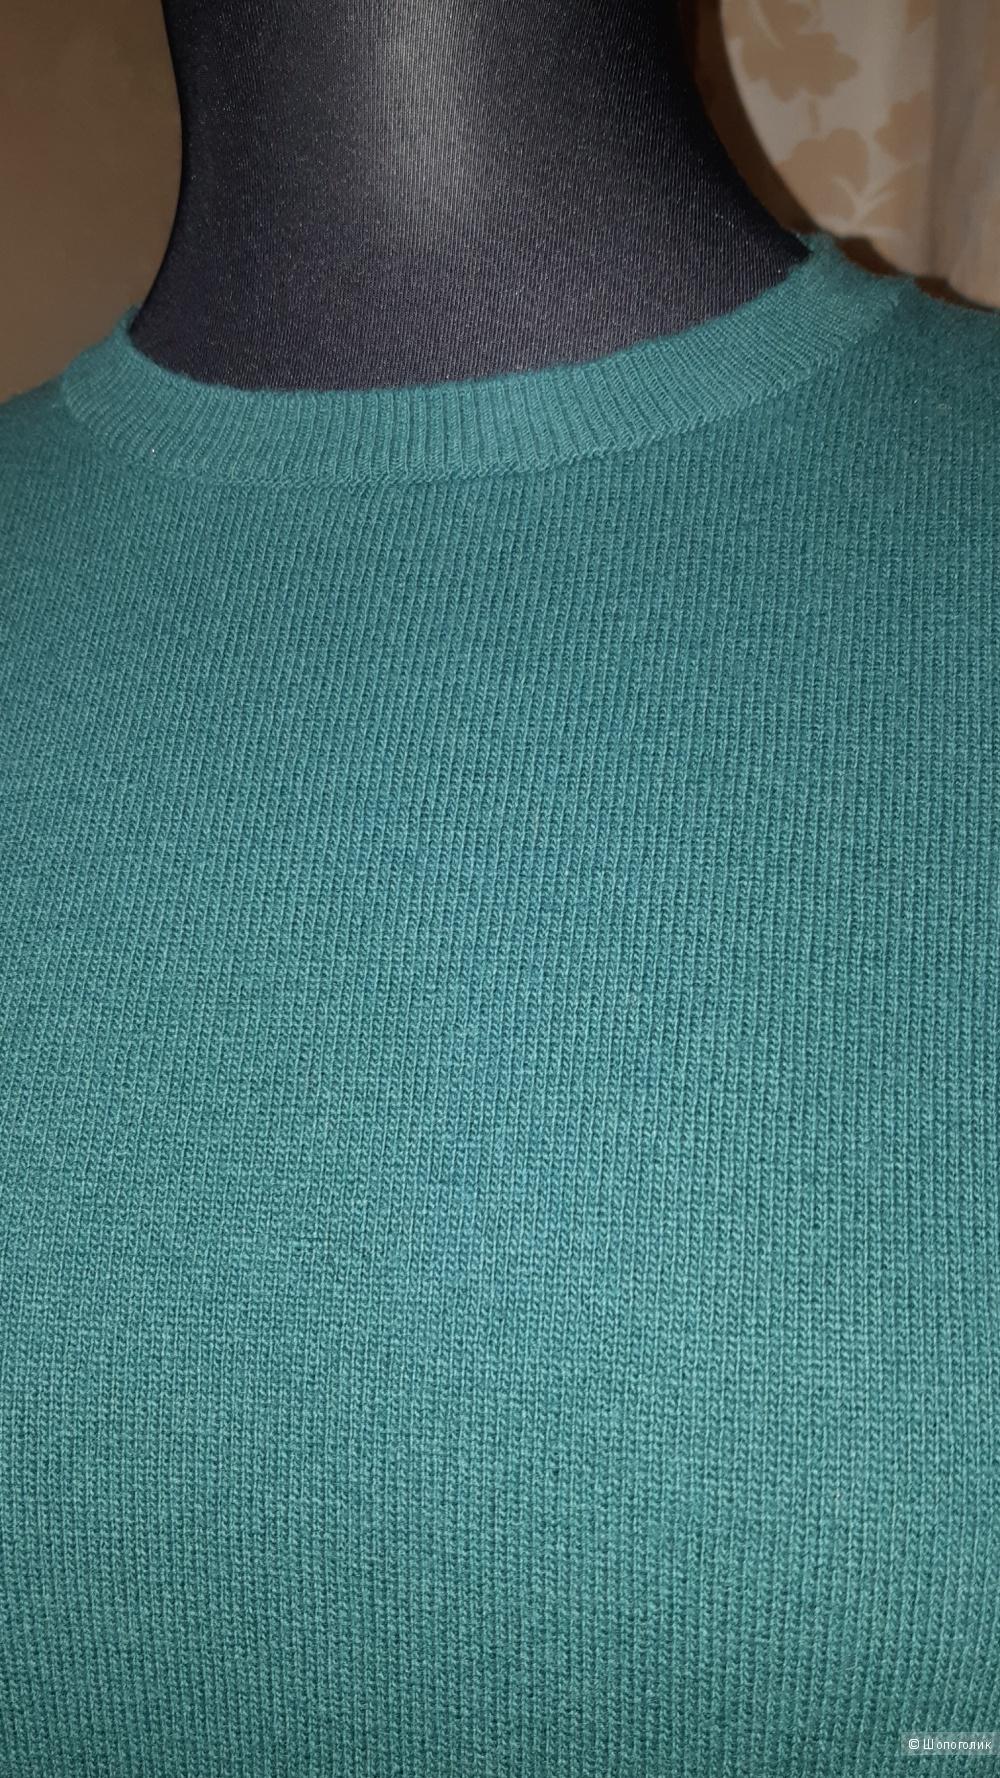 Пуловер benetton, размер m/l